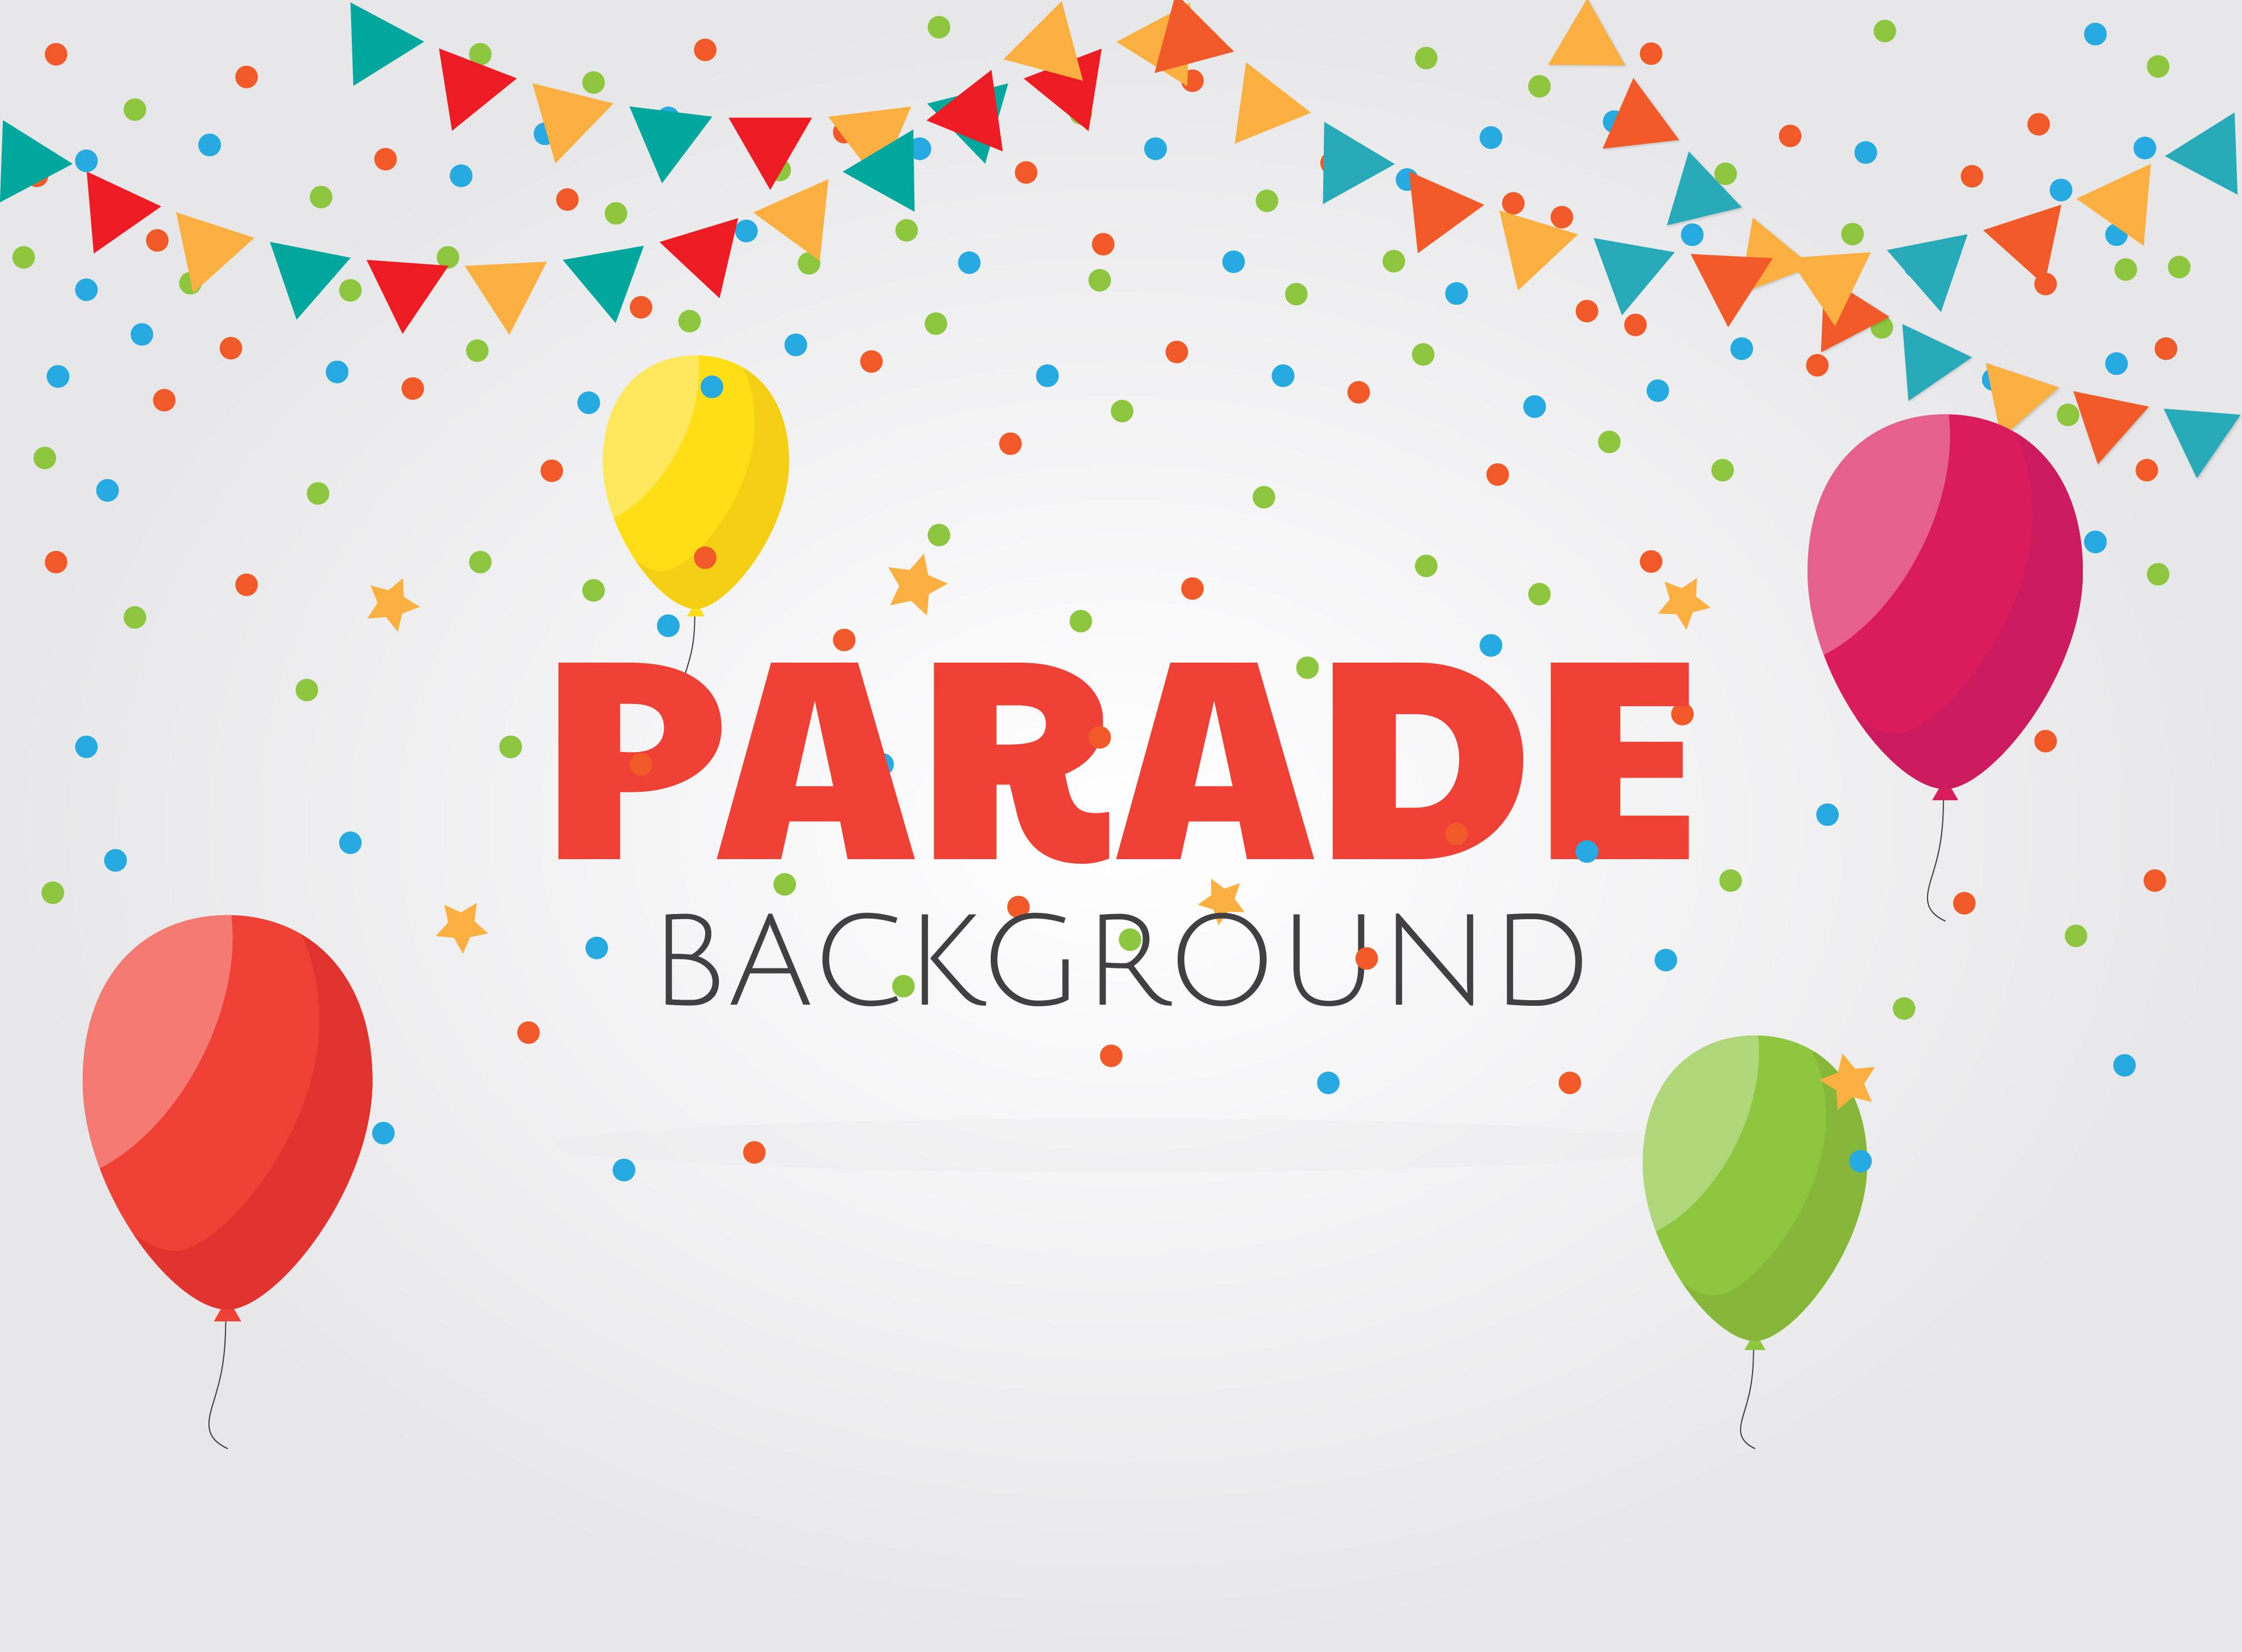 parade background